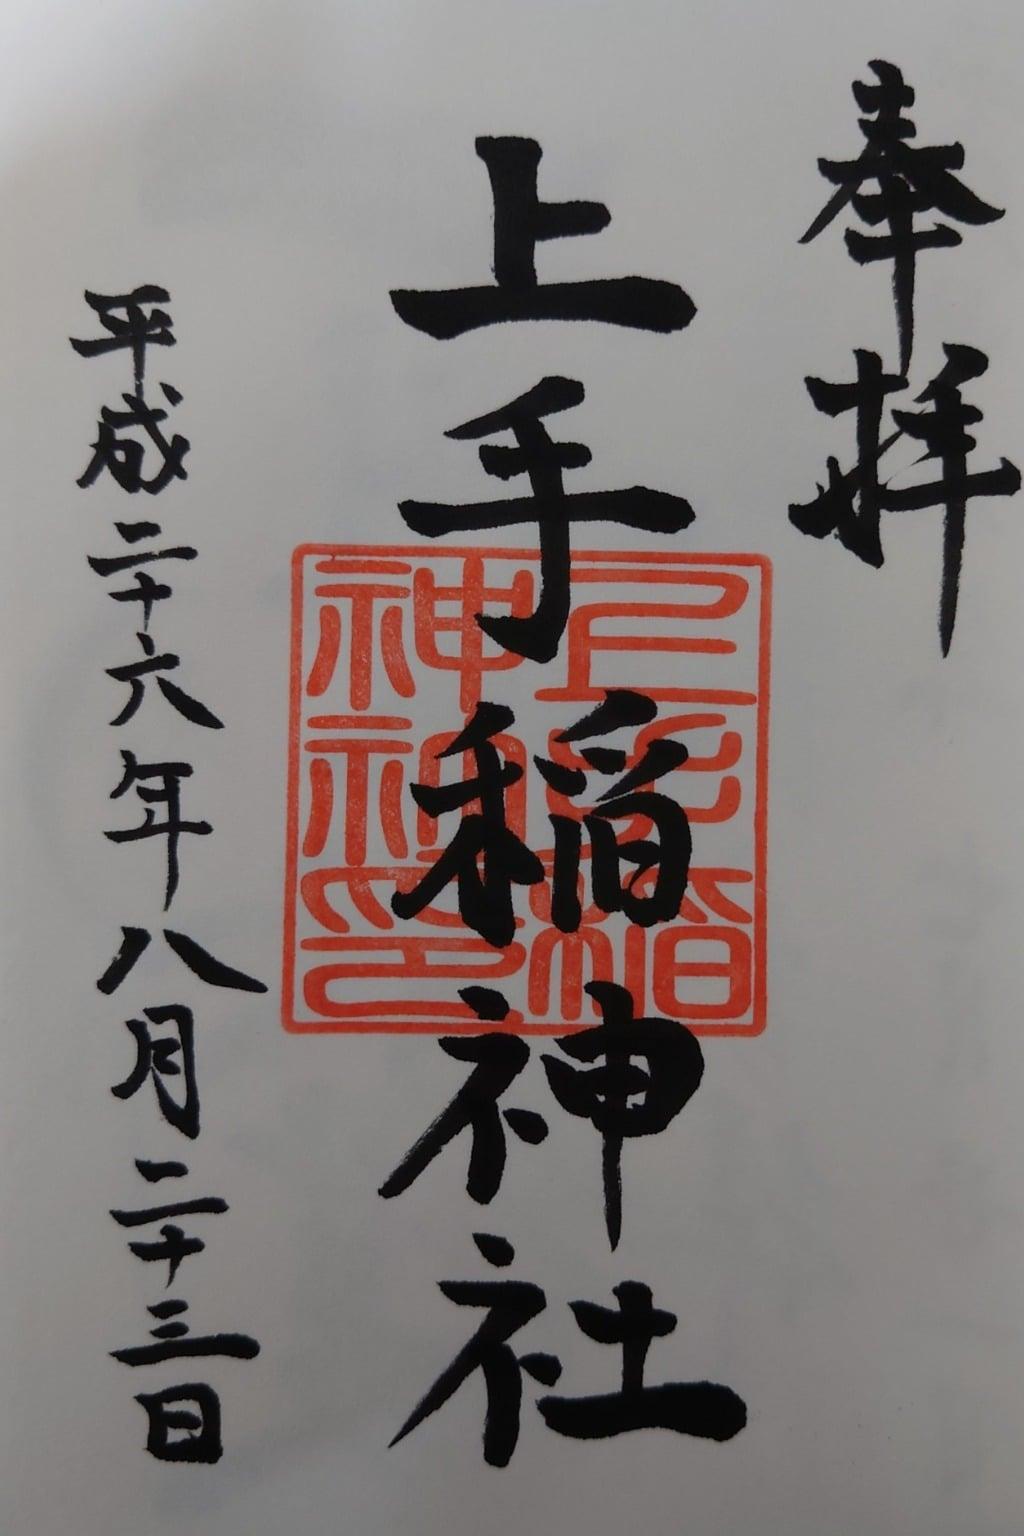 上手稲神社の御朱印